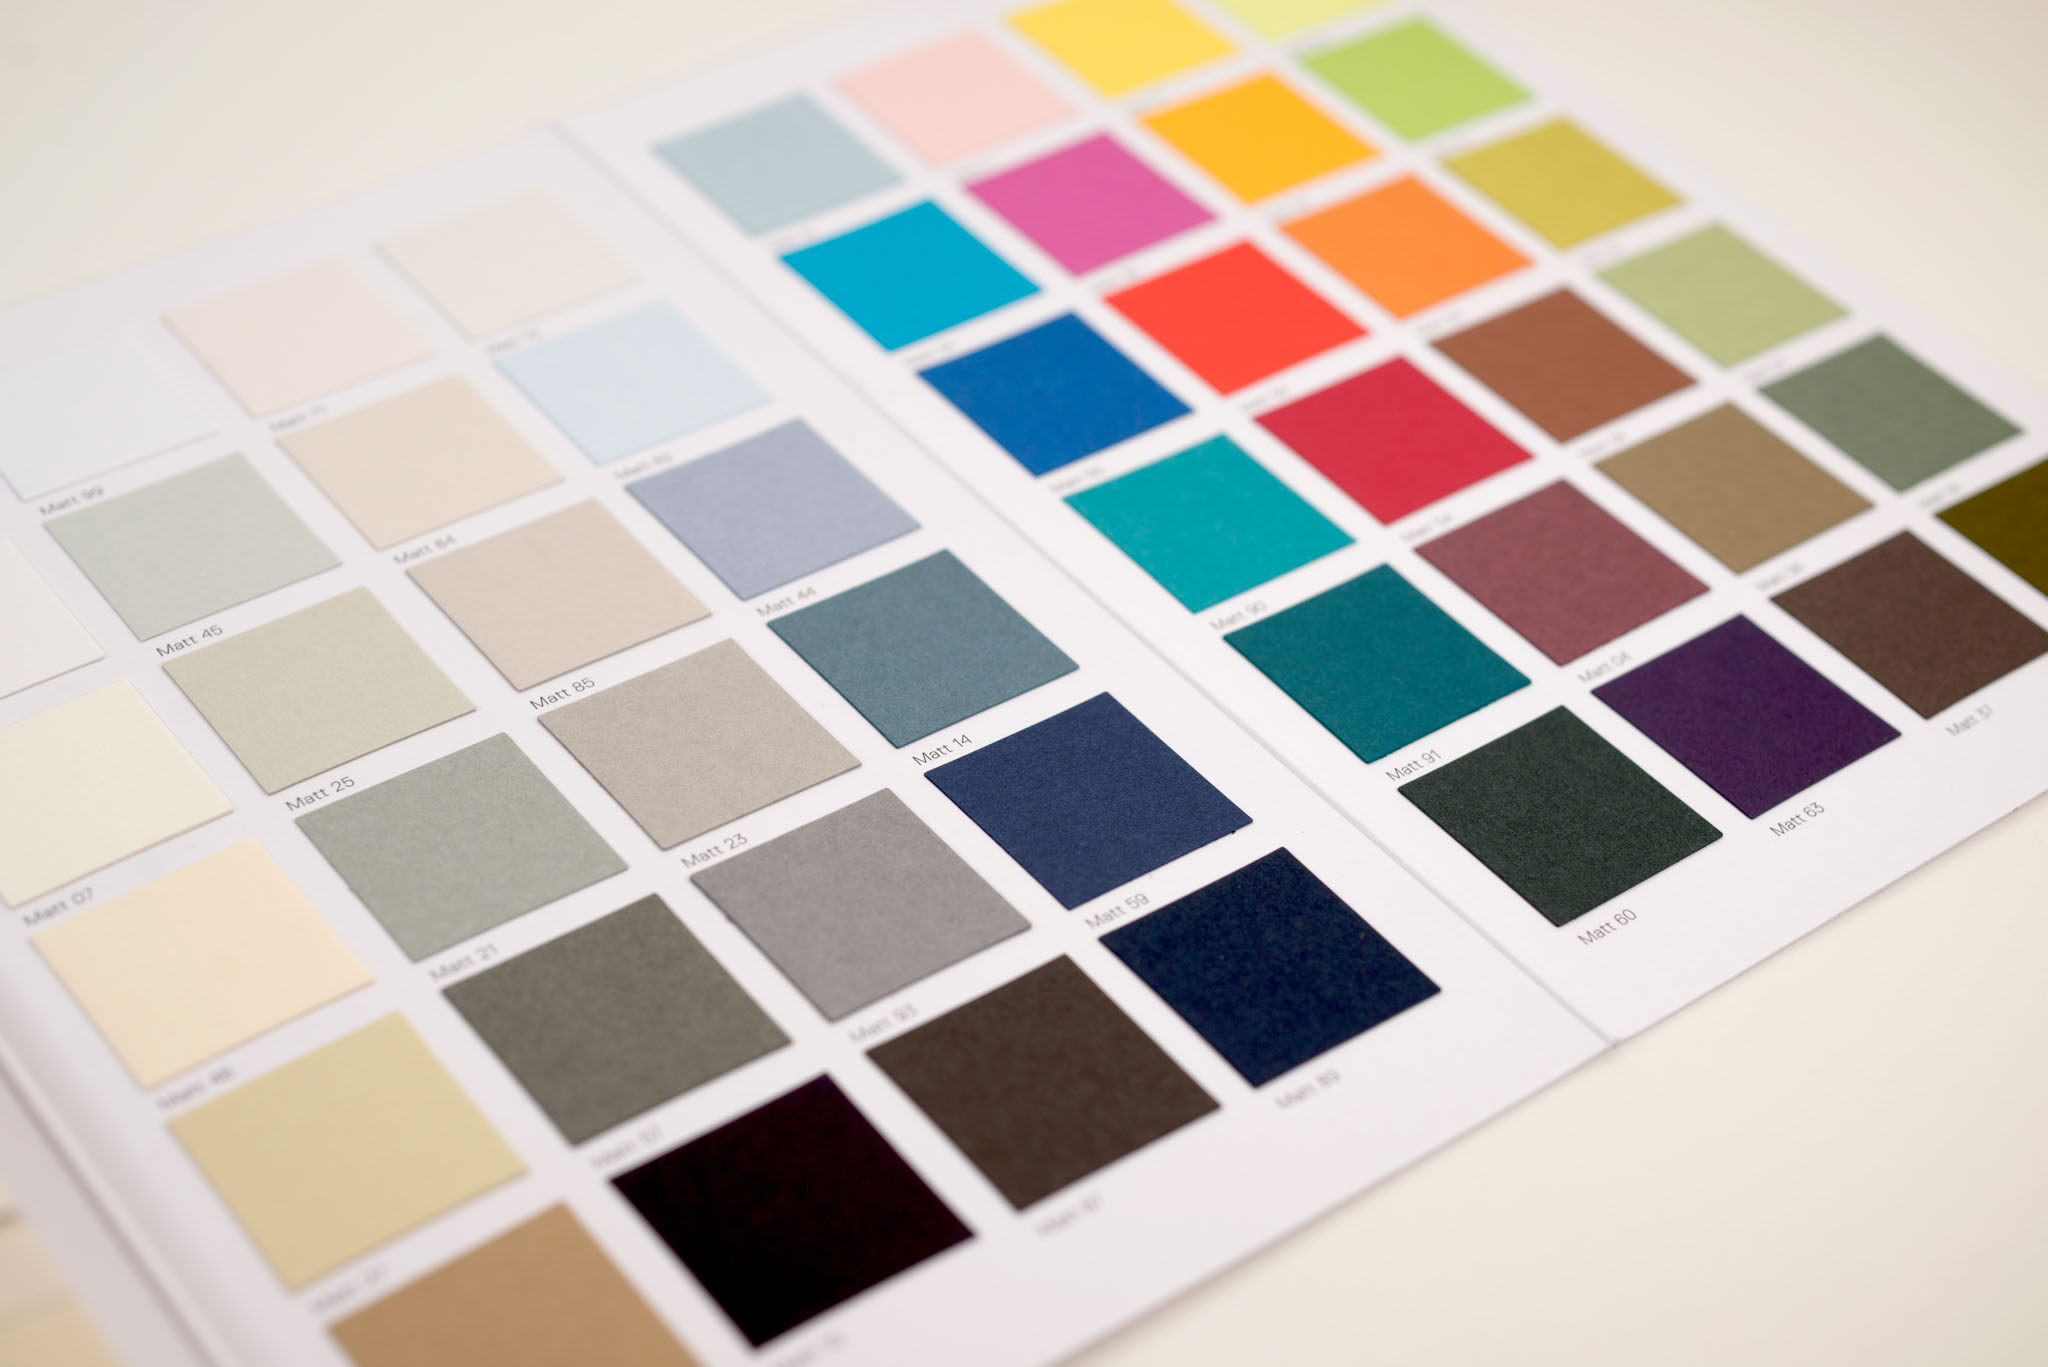 Gmund Matt paleta de colores